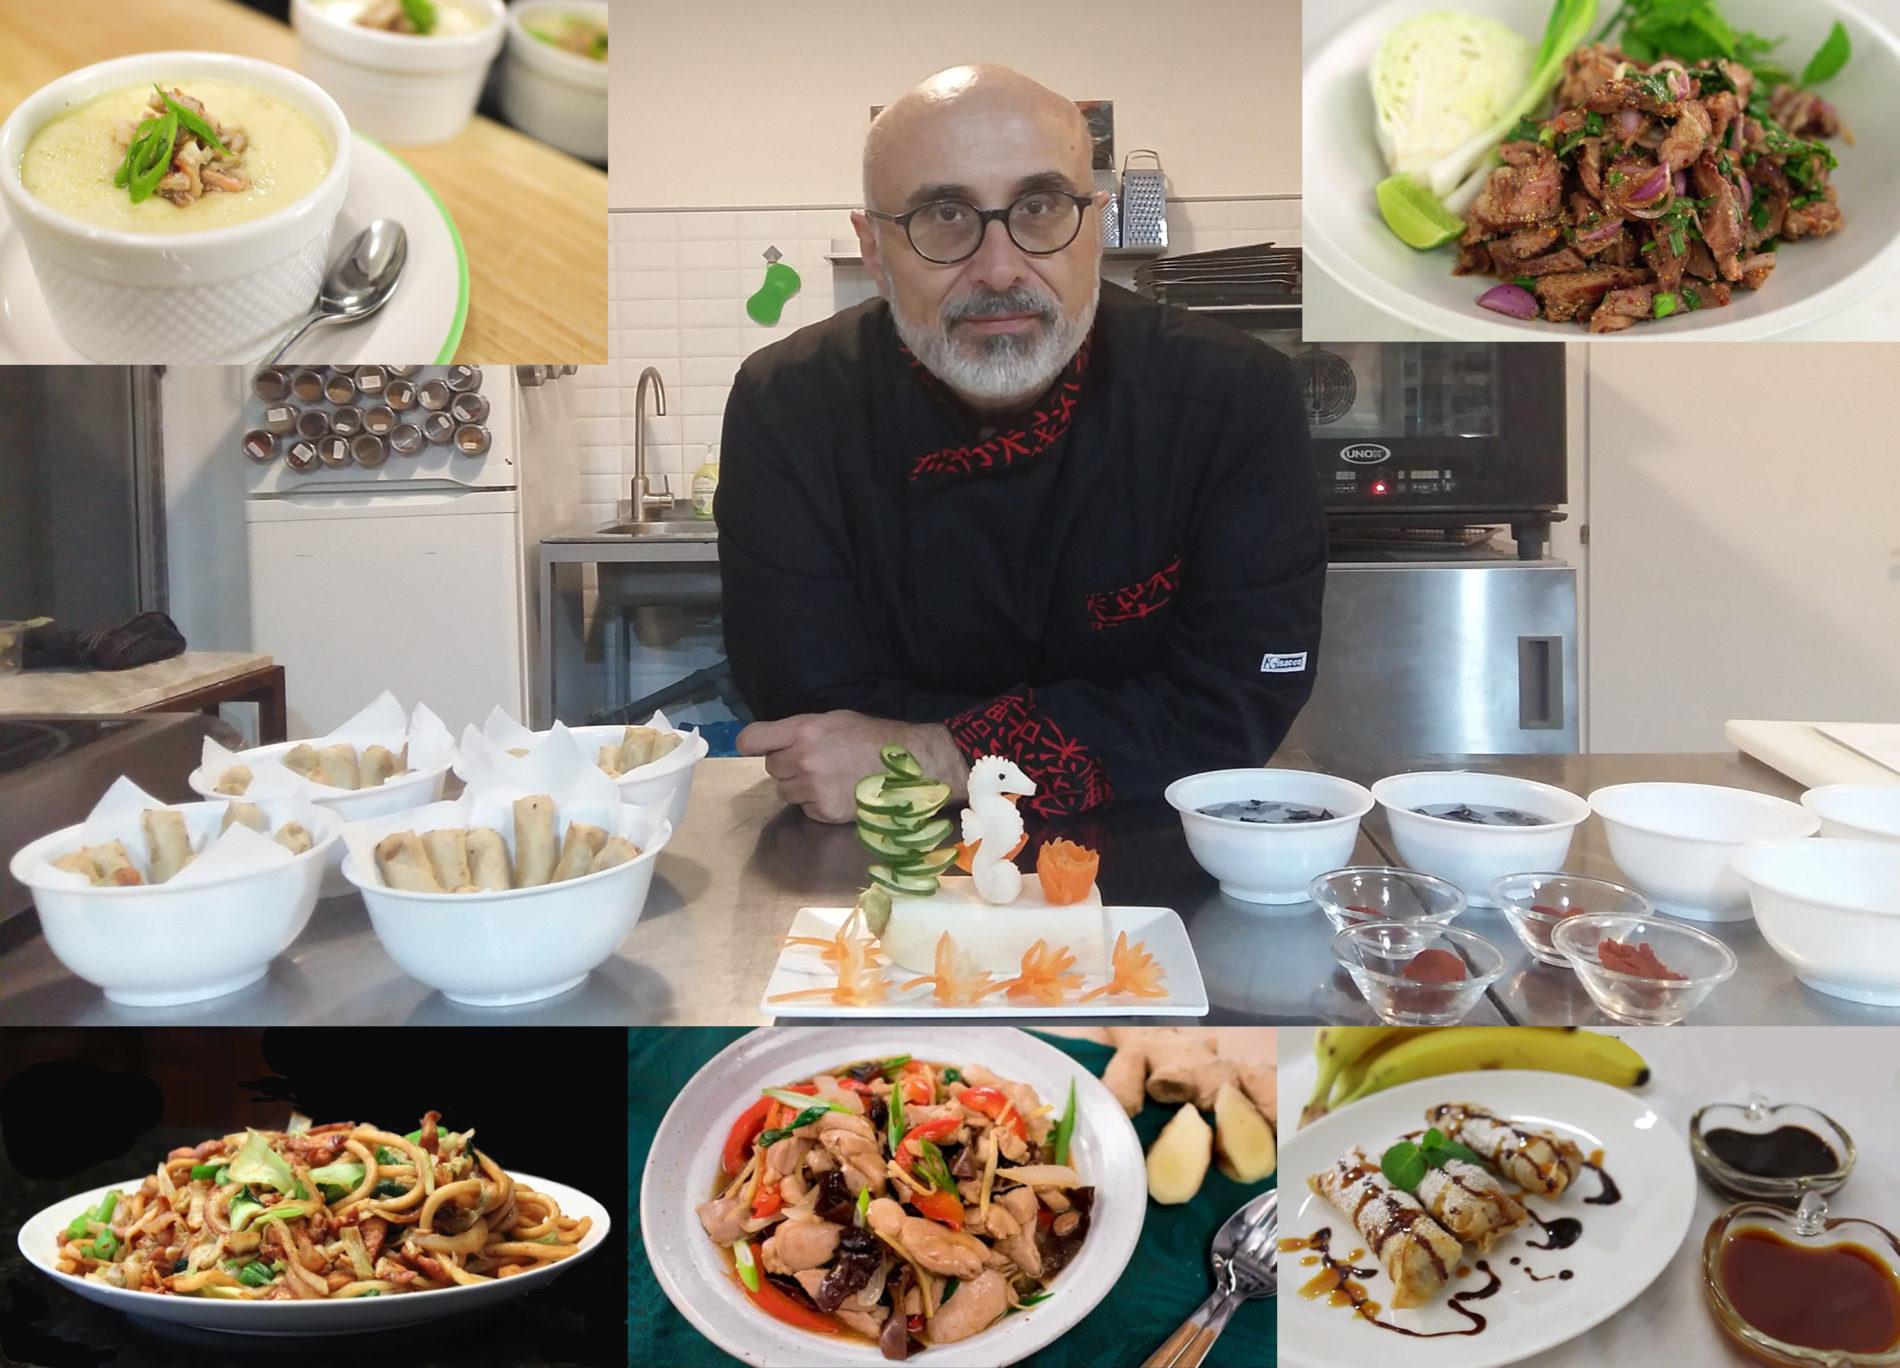 News eventi mind scuola di cucina roma - Scuola di cucina roma ...